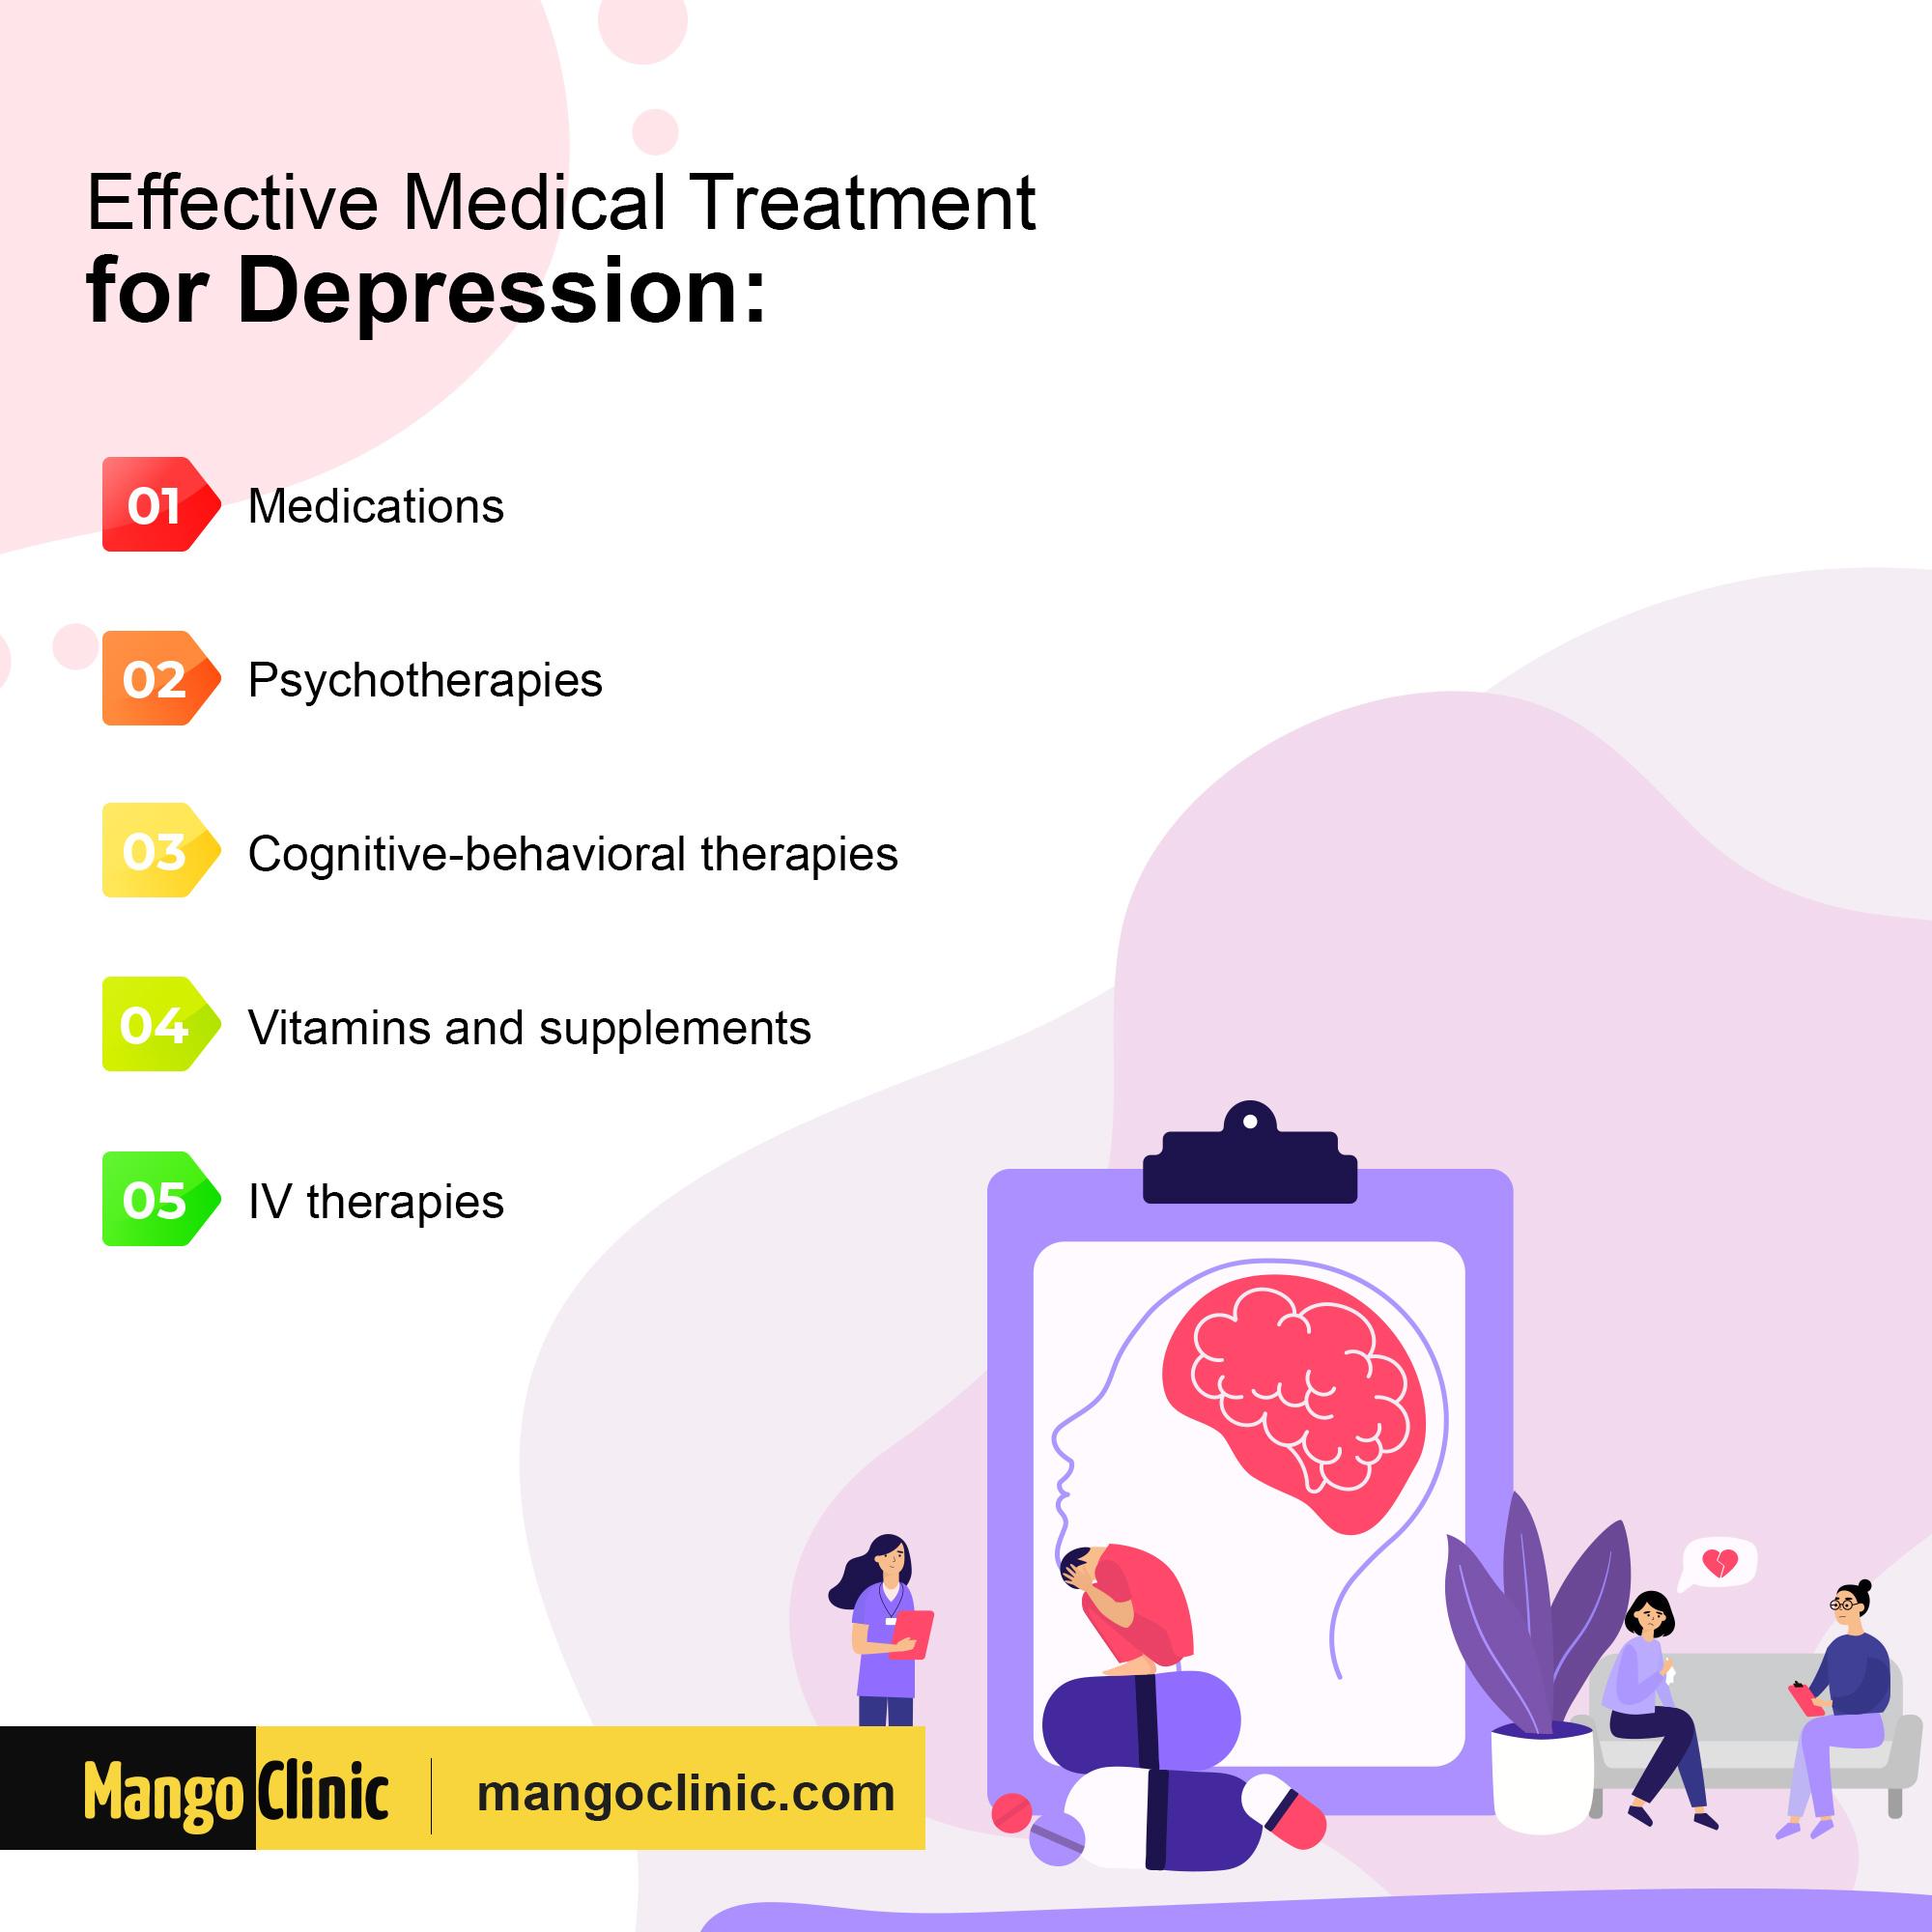 Medical treatment for depression